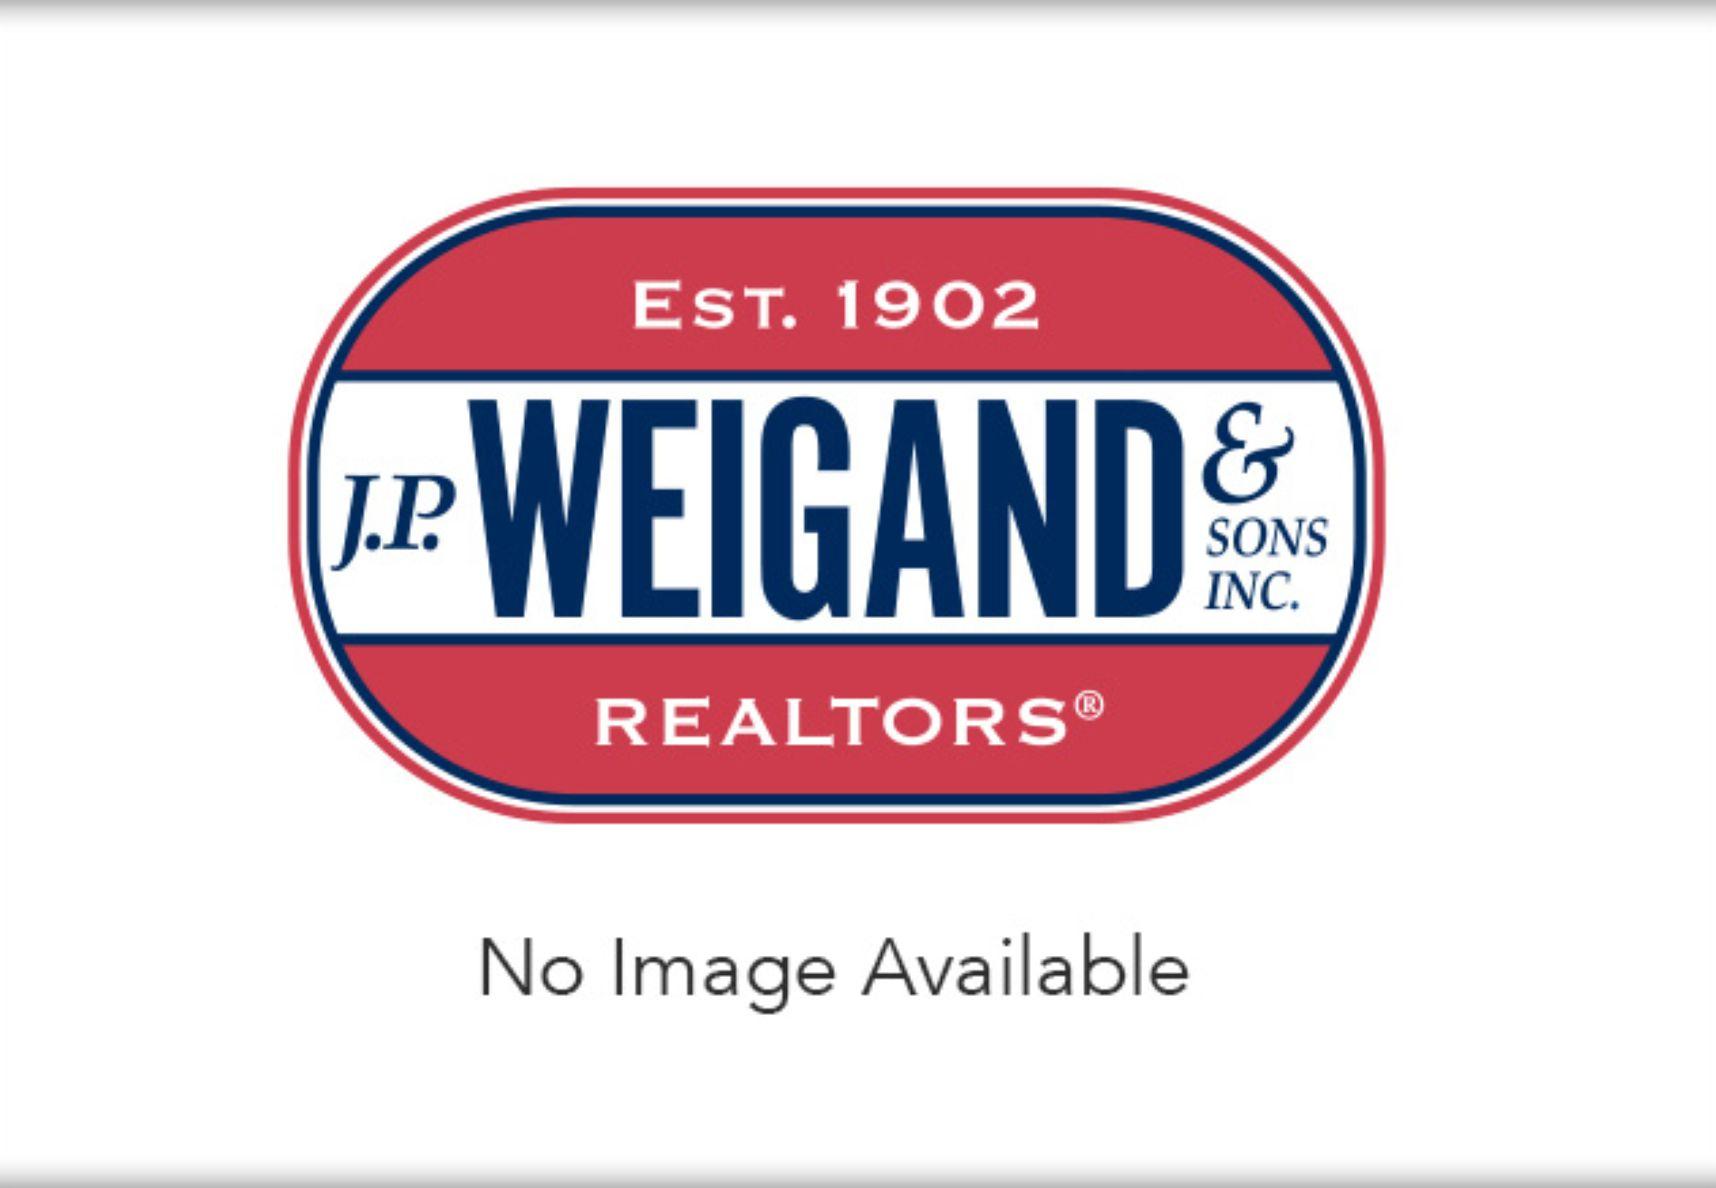 433 N WESTFIELD CT Wichita, KS 67212 - Photo 1